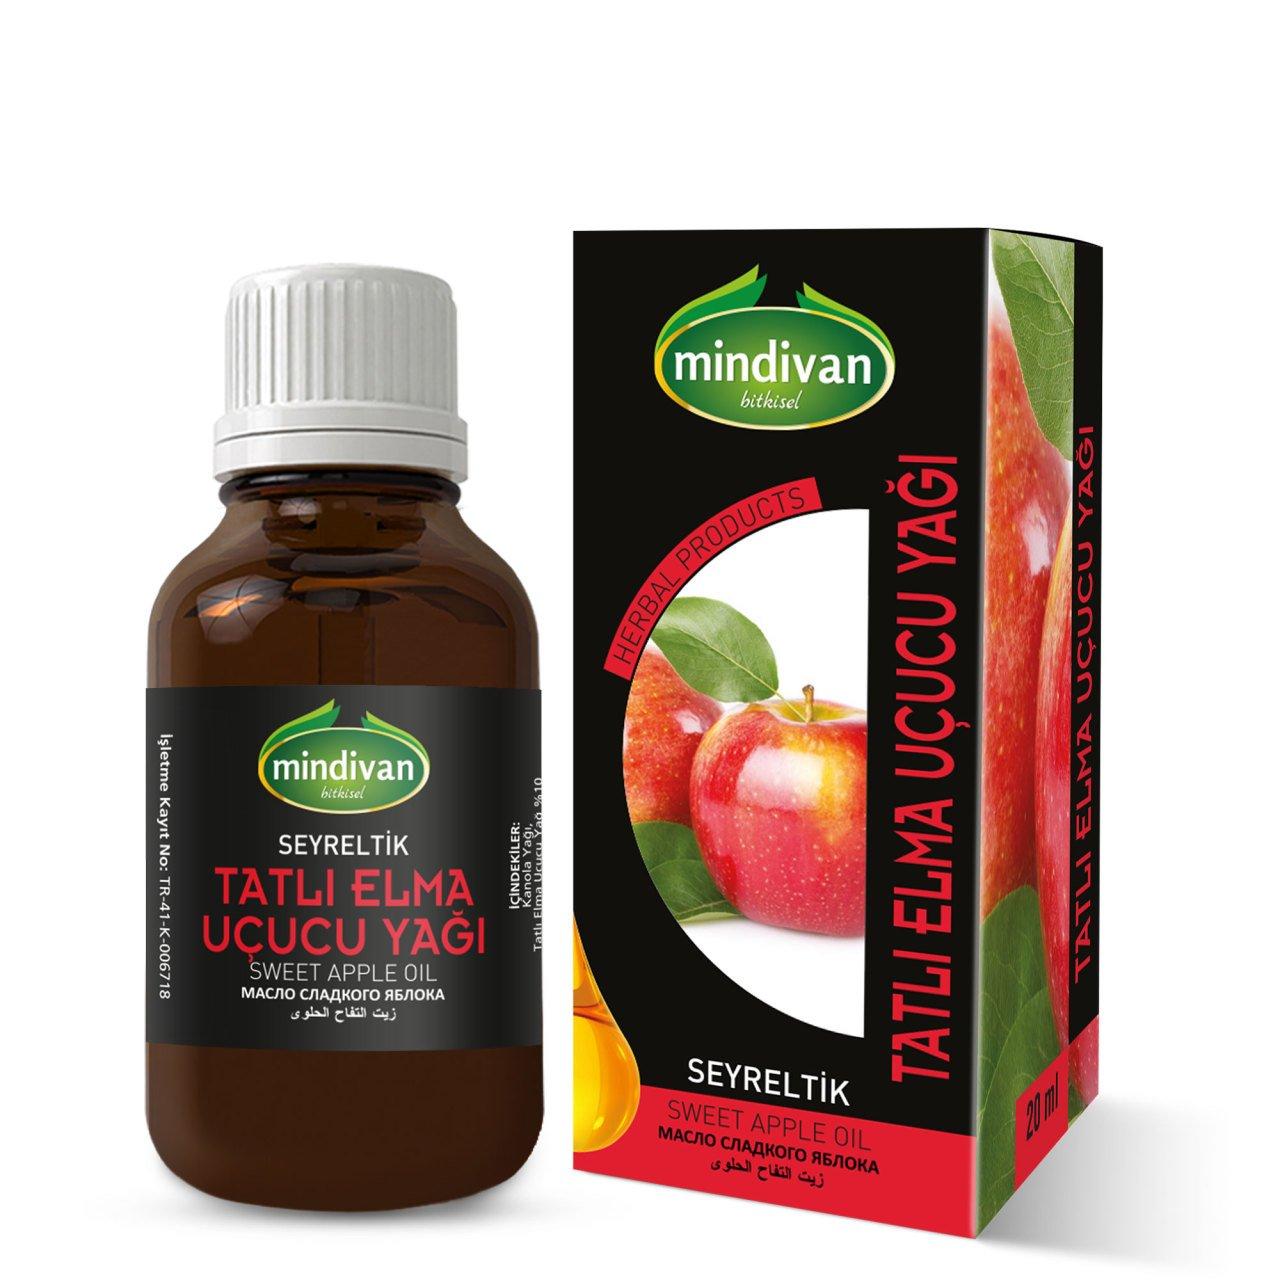 Mindivan Tatlı Elma Yağı 20 ml ürünü